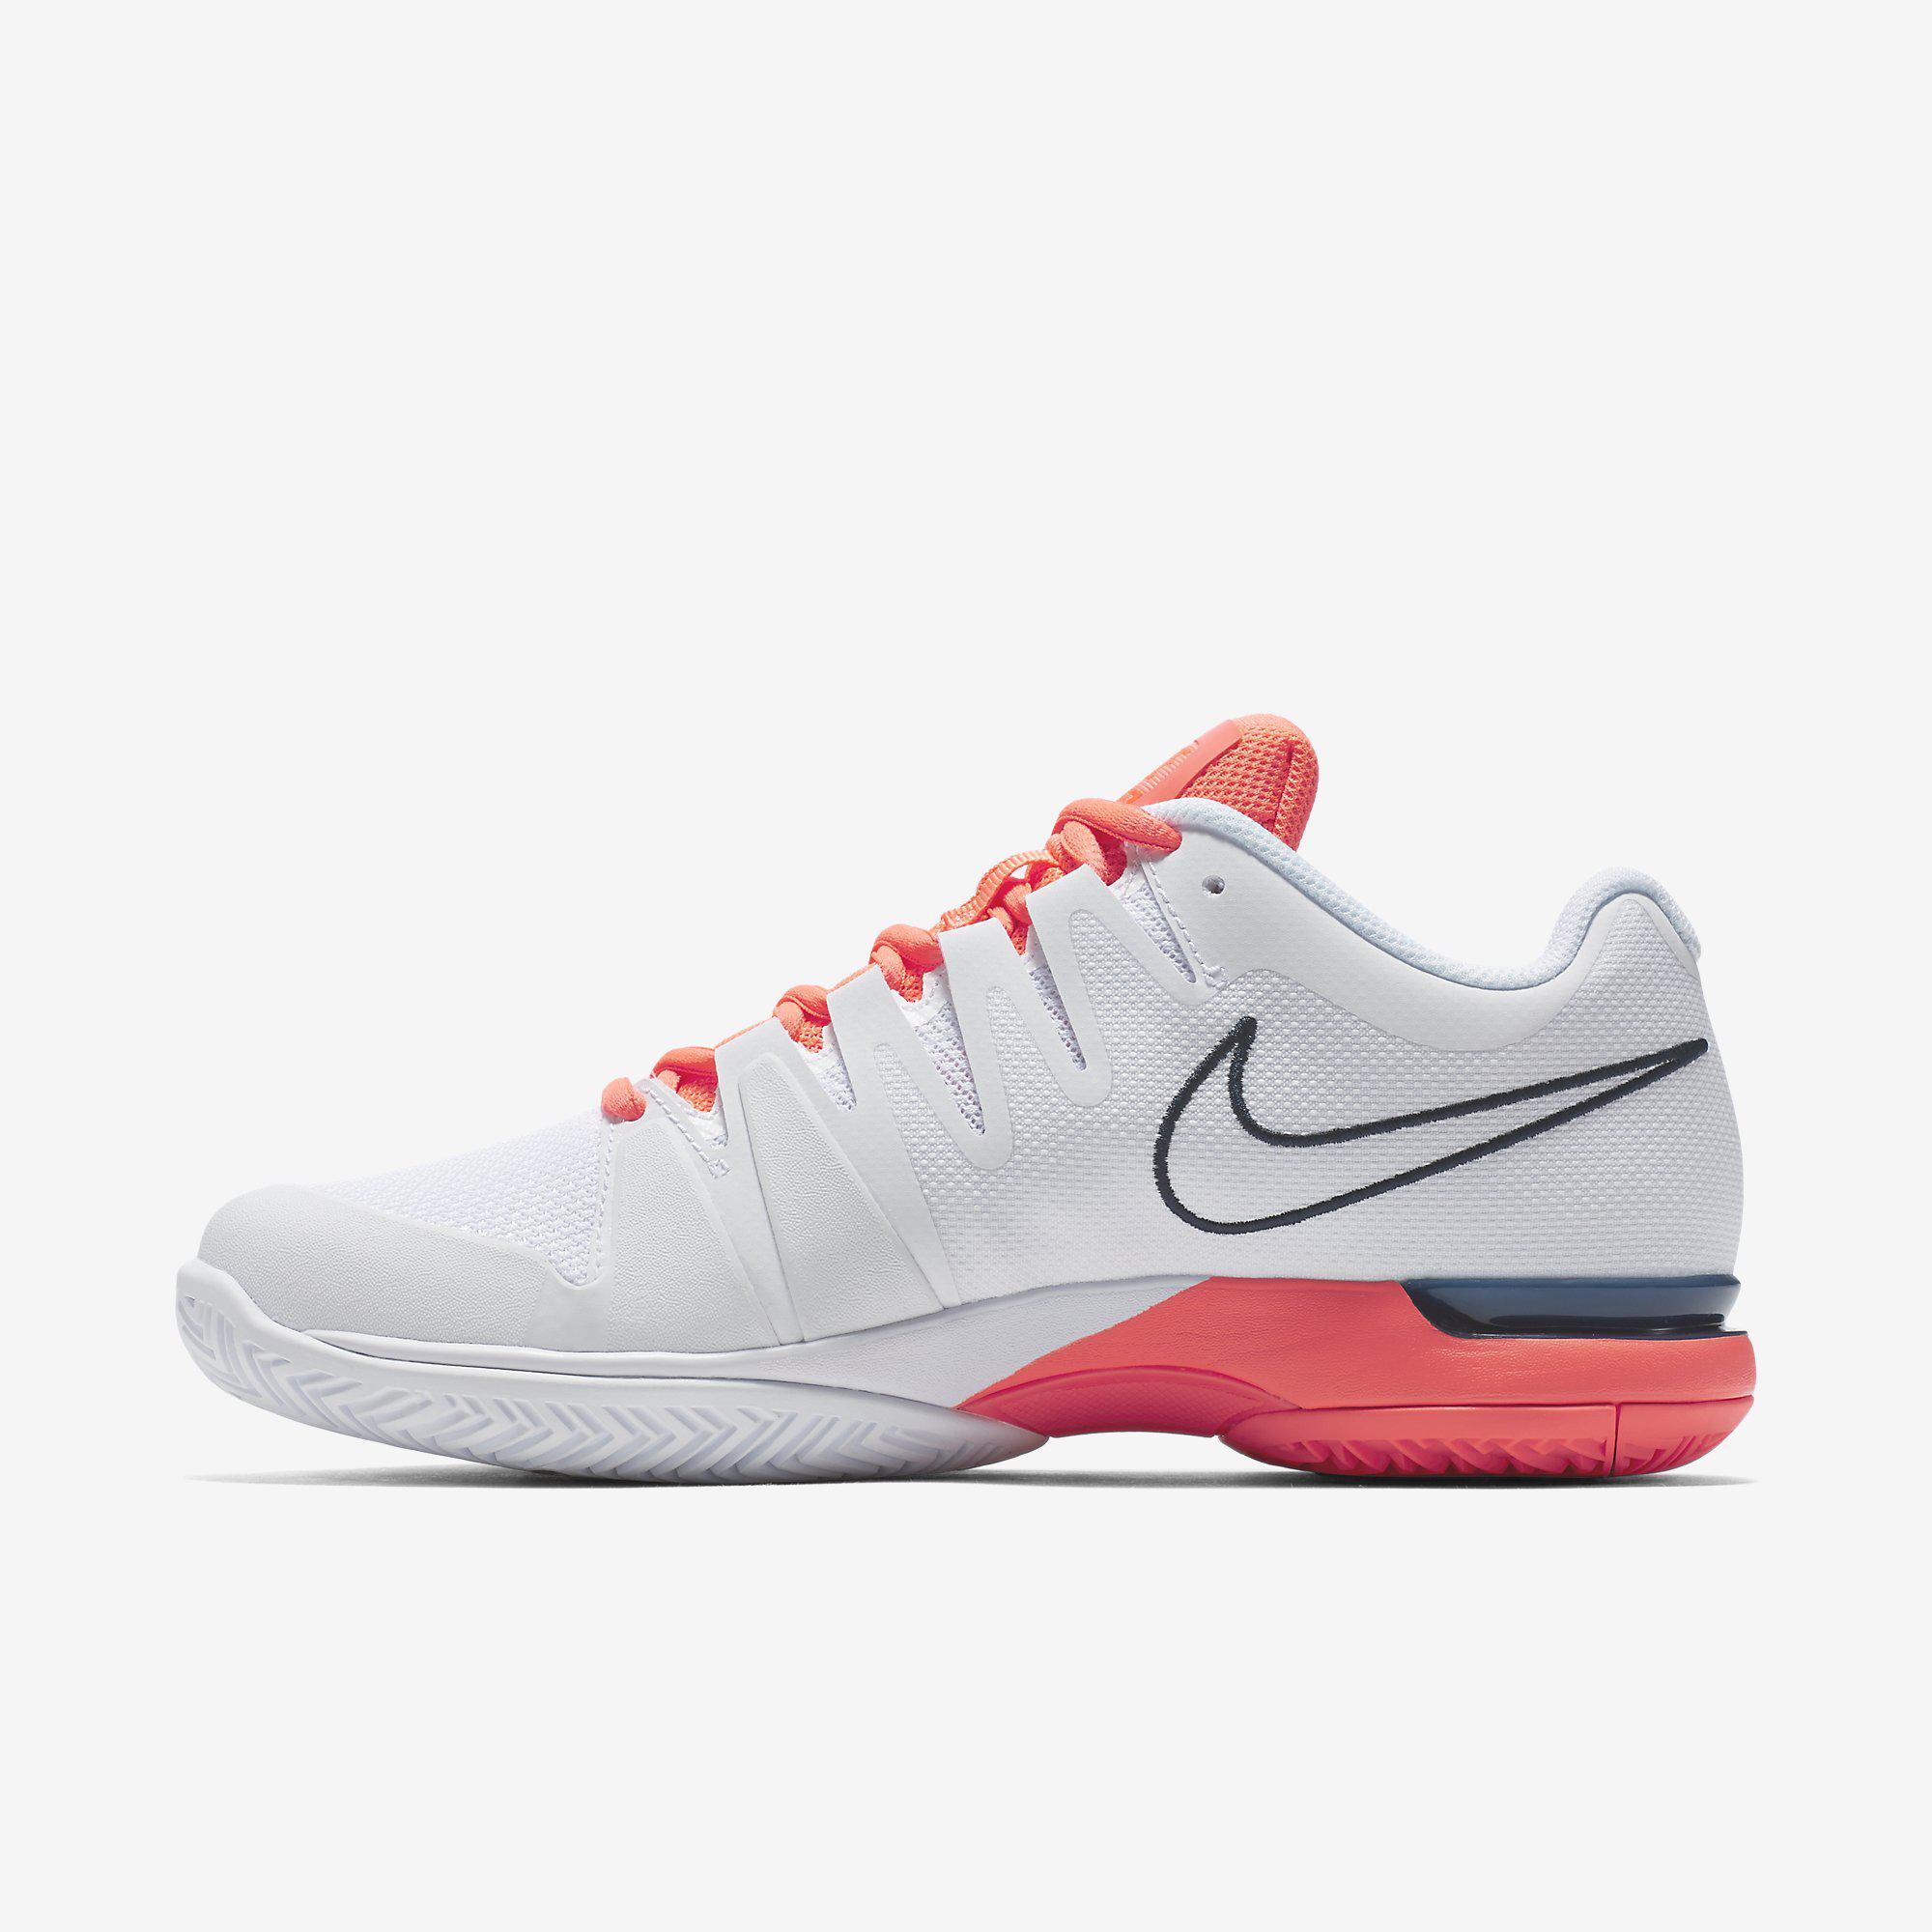 Nike Womens Zoom Vapor 9.5 Tennis Shoes - White/Navy/Bright Mango